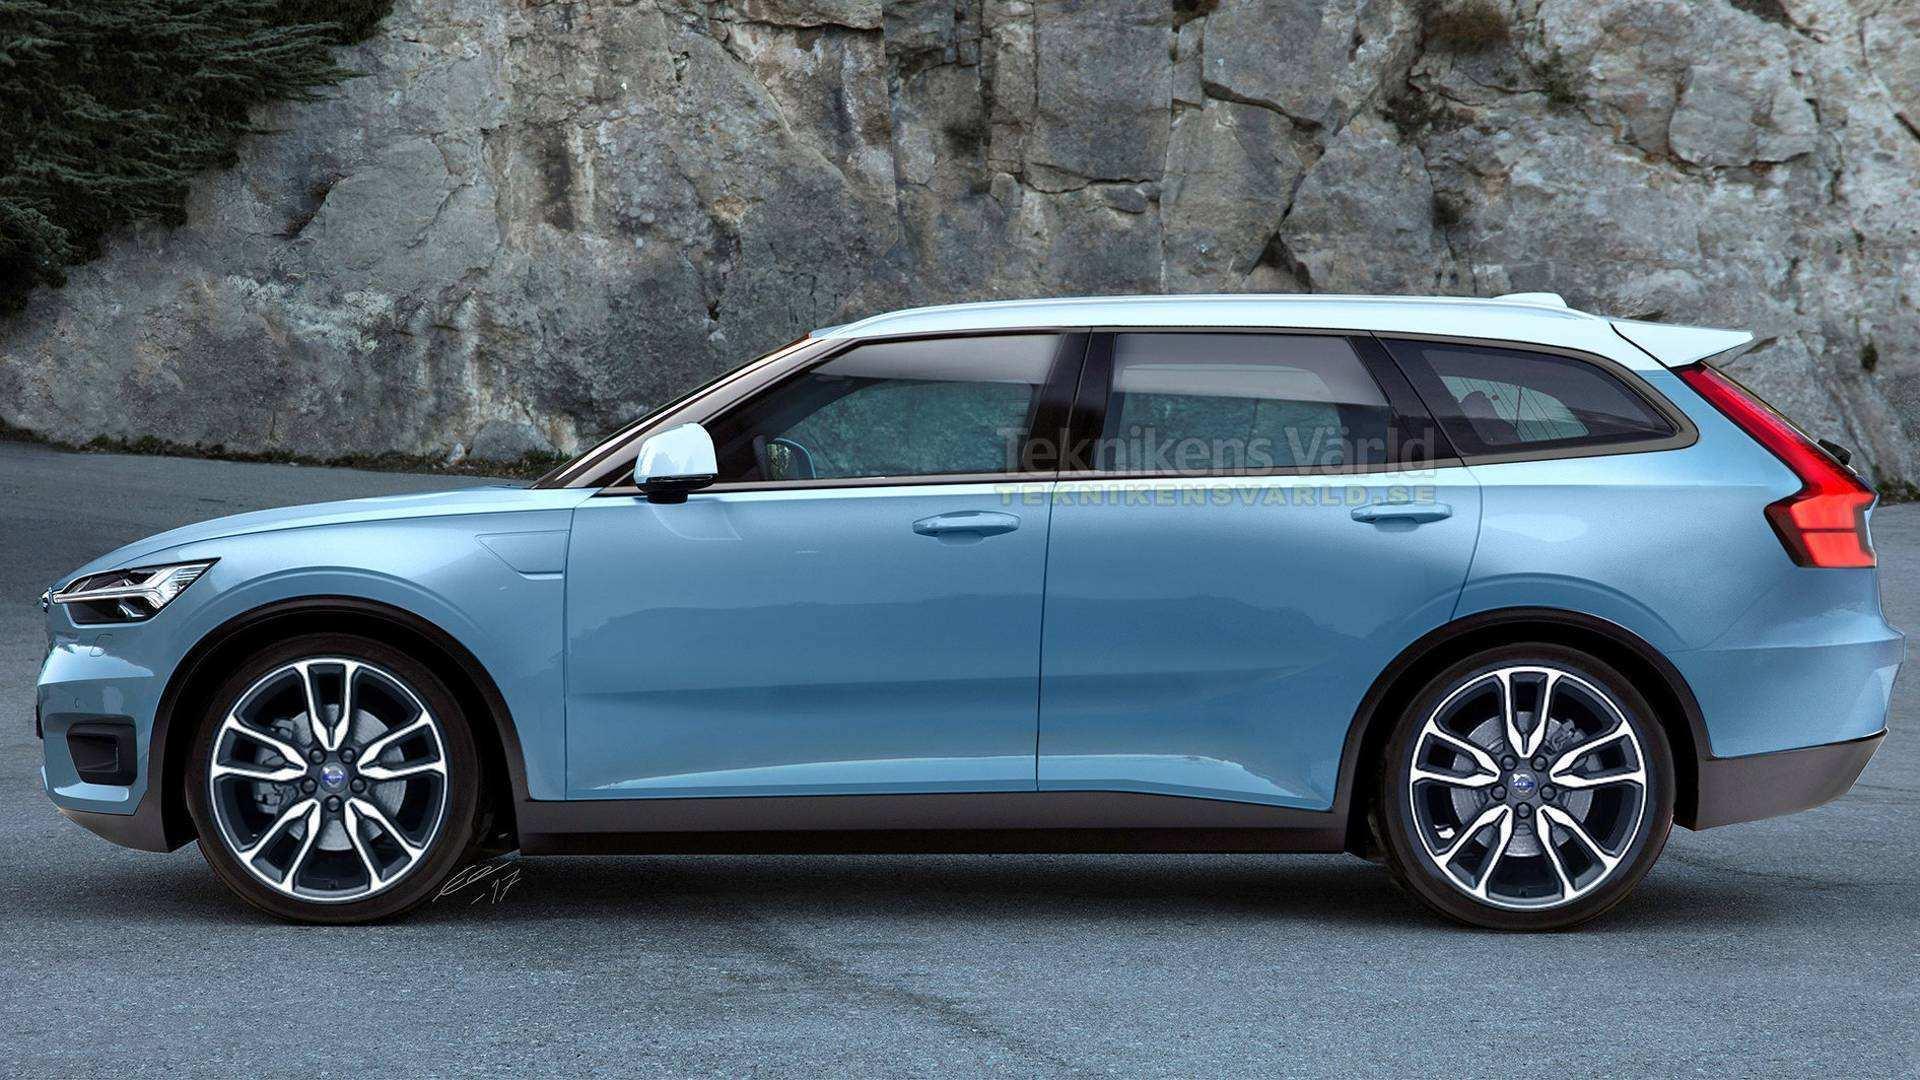 28 All New Volvo 2019 V40 Performance by Volvo 2019 V40